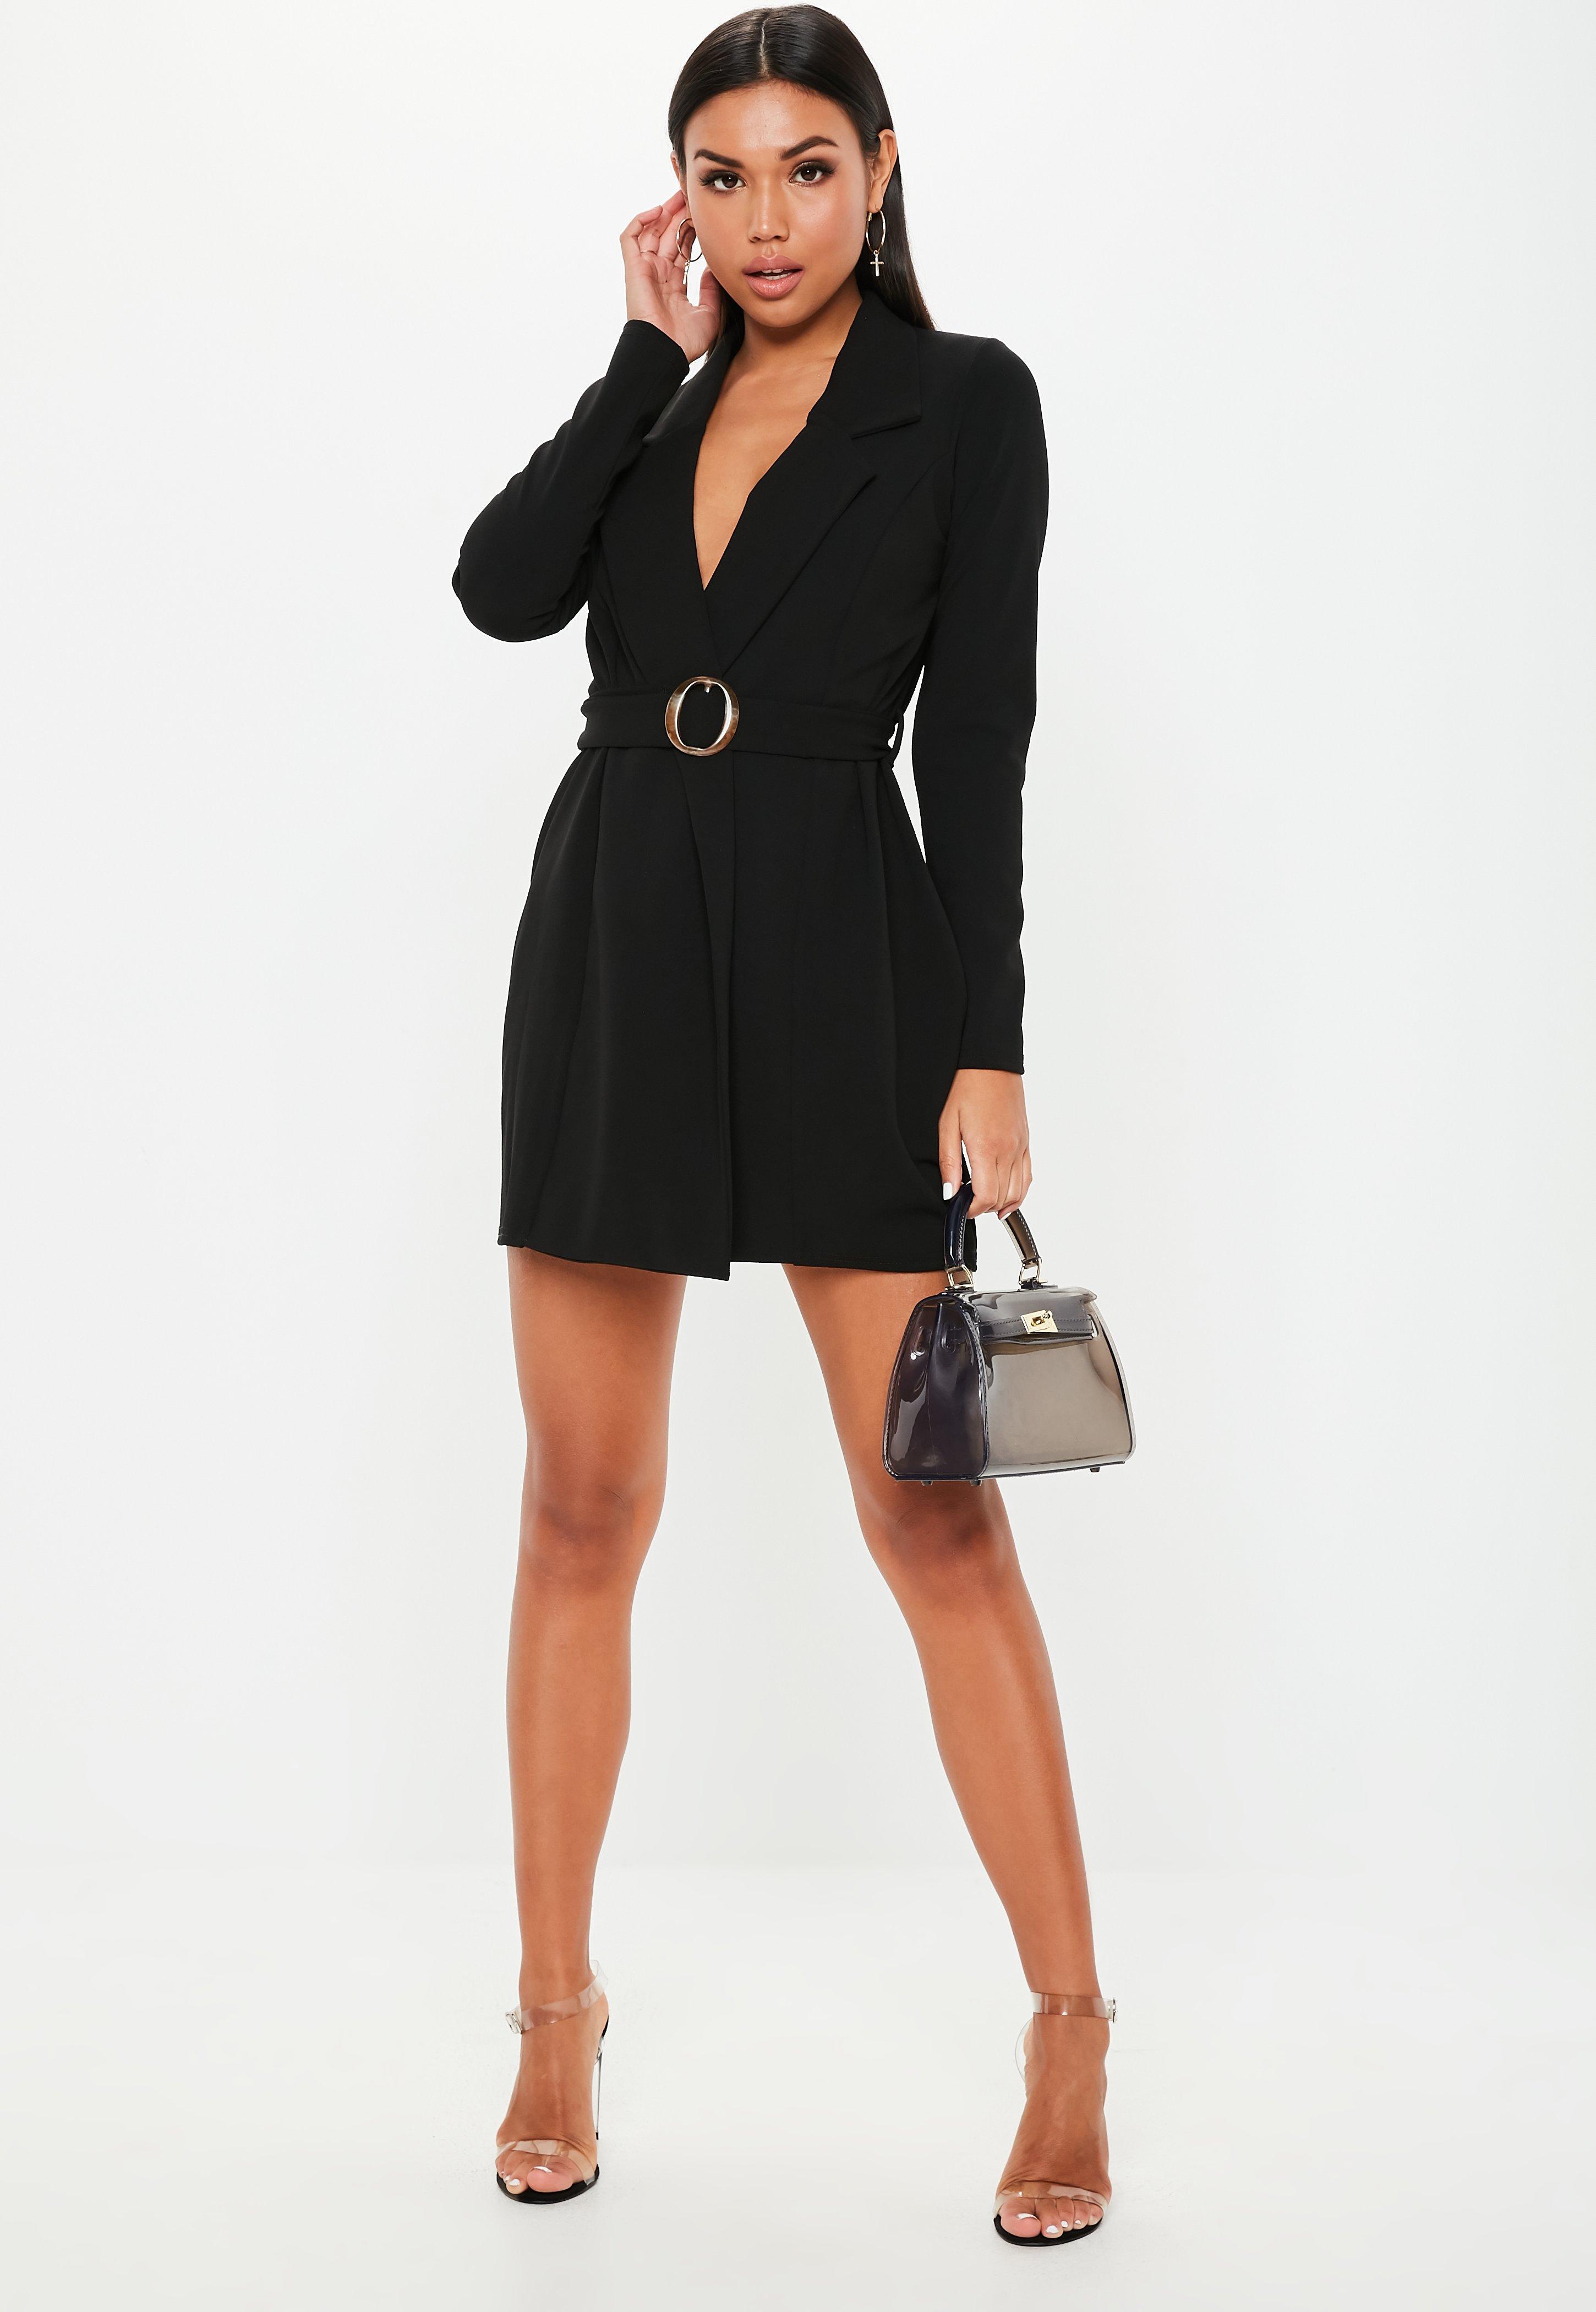 6f1a0b5c7b3ba Blazer Dresses   Tuxedo Dresses Online - Missguided